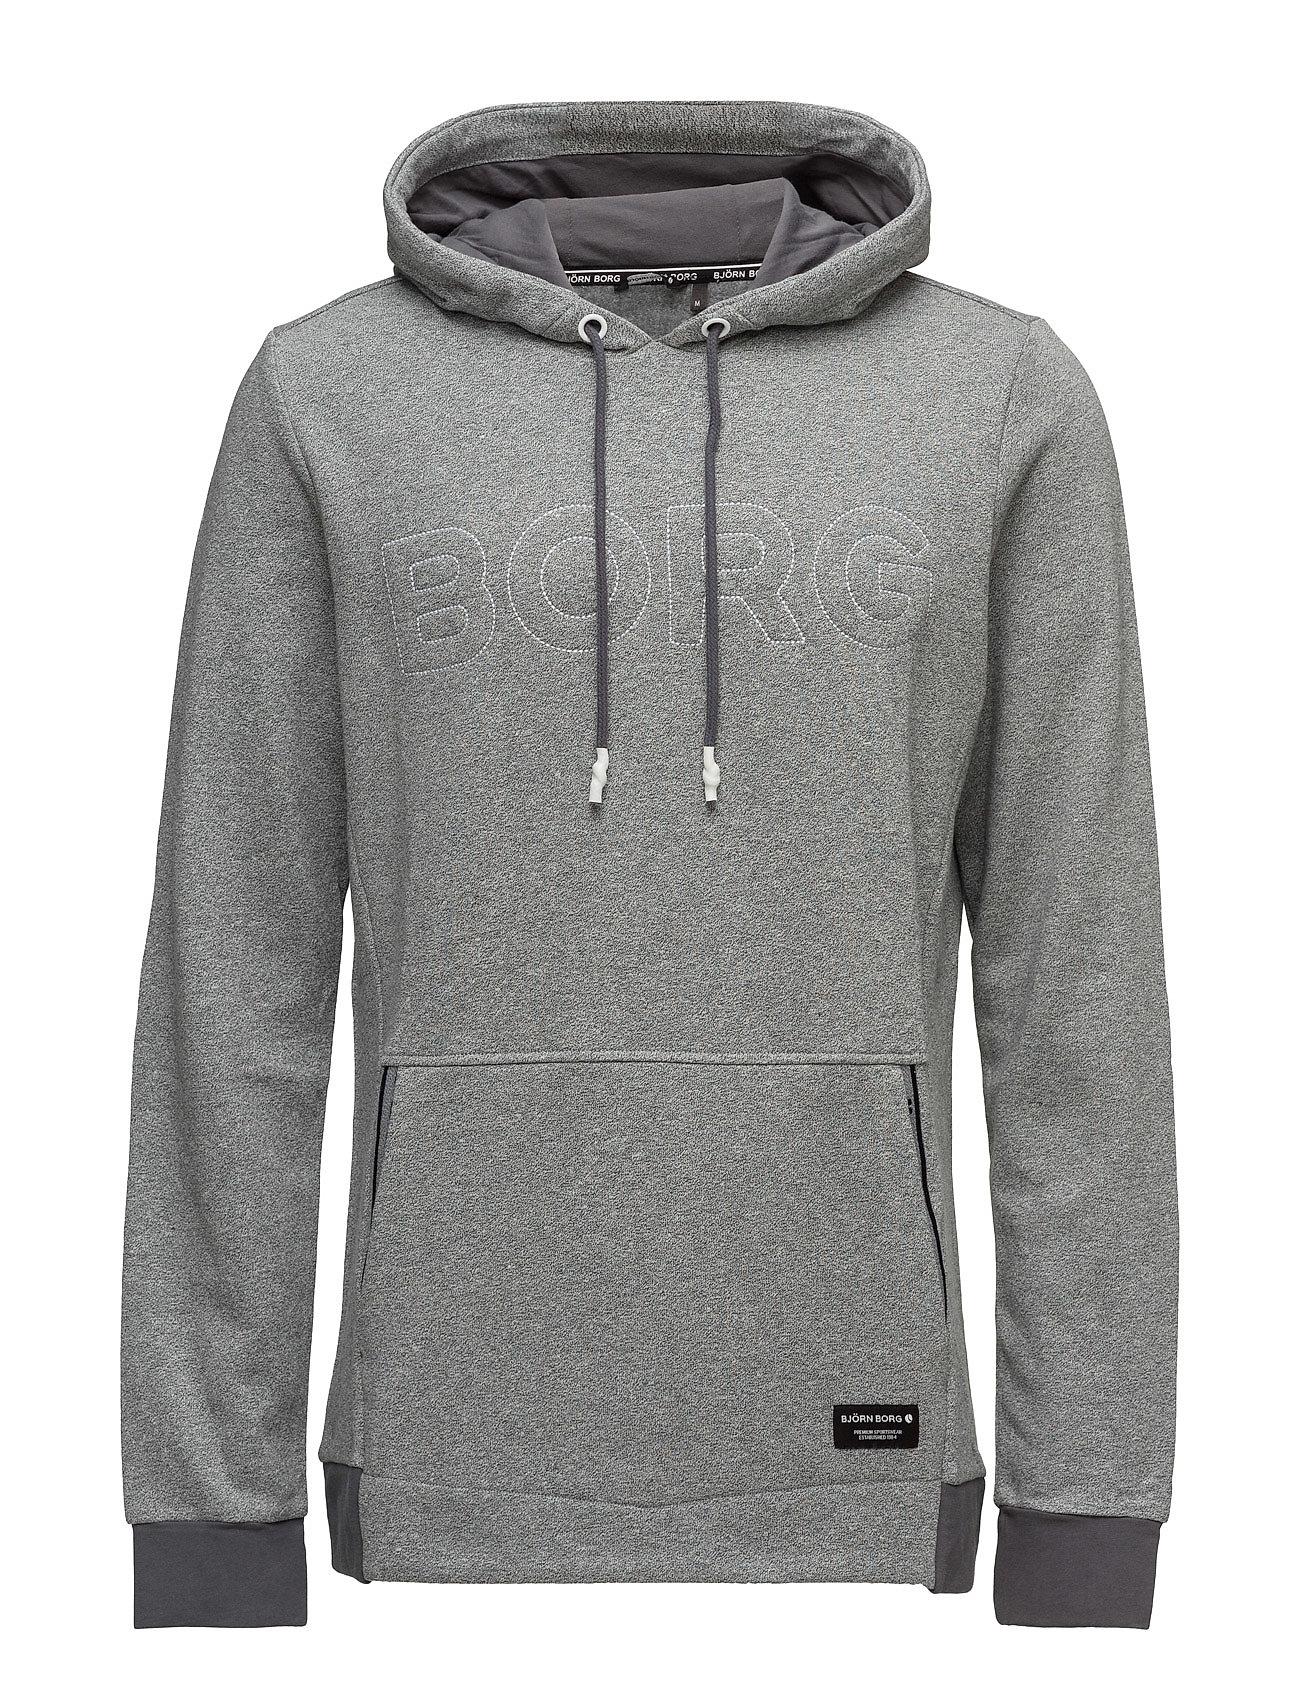 1p Hood Brook Bjˆrn Borg Sports sweatshirts til Herrer i